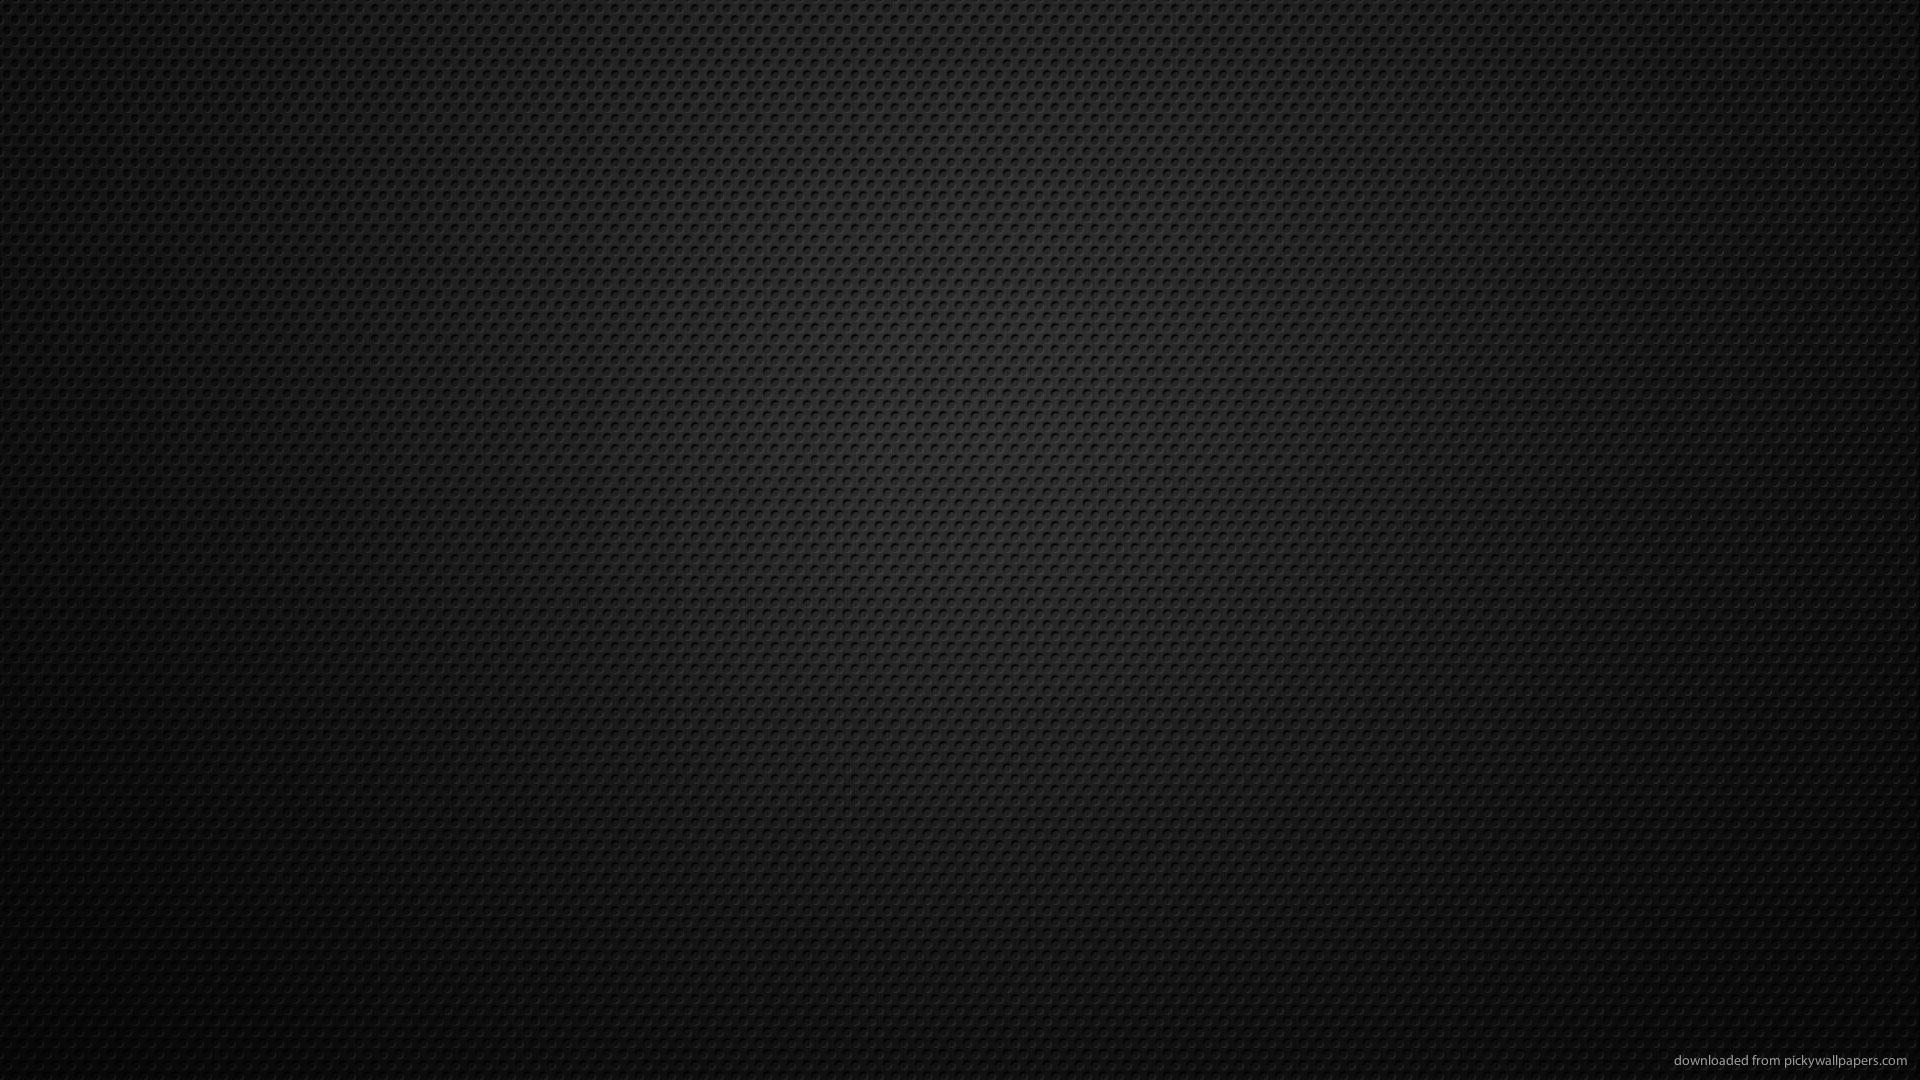 Download 1920x1080 Simple Black Wallpaper 1920x1080